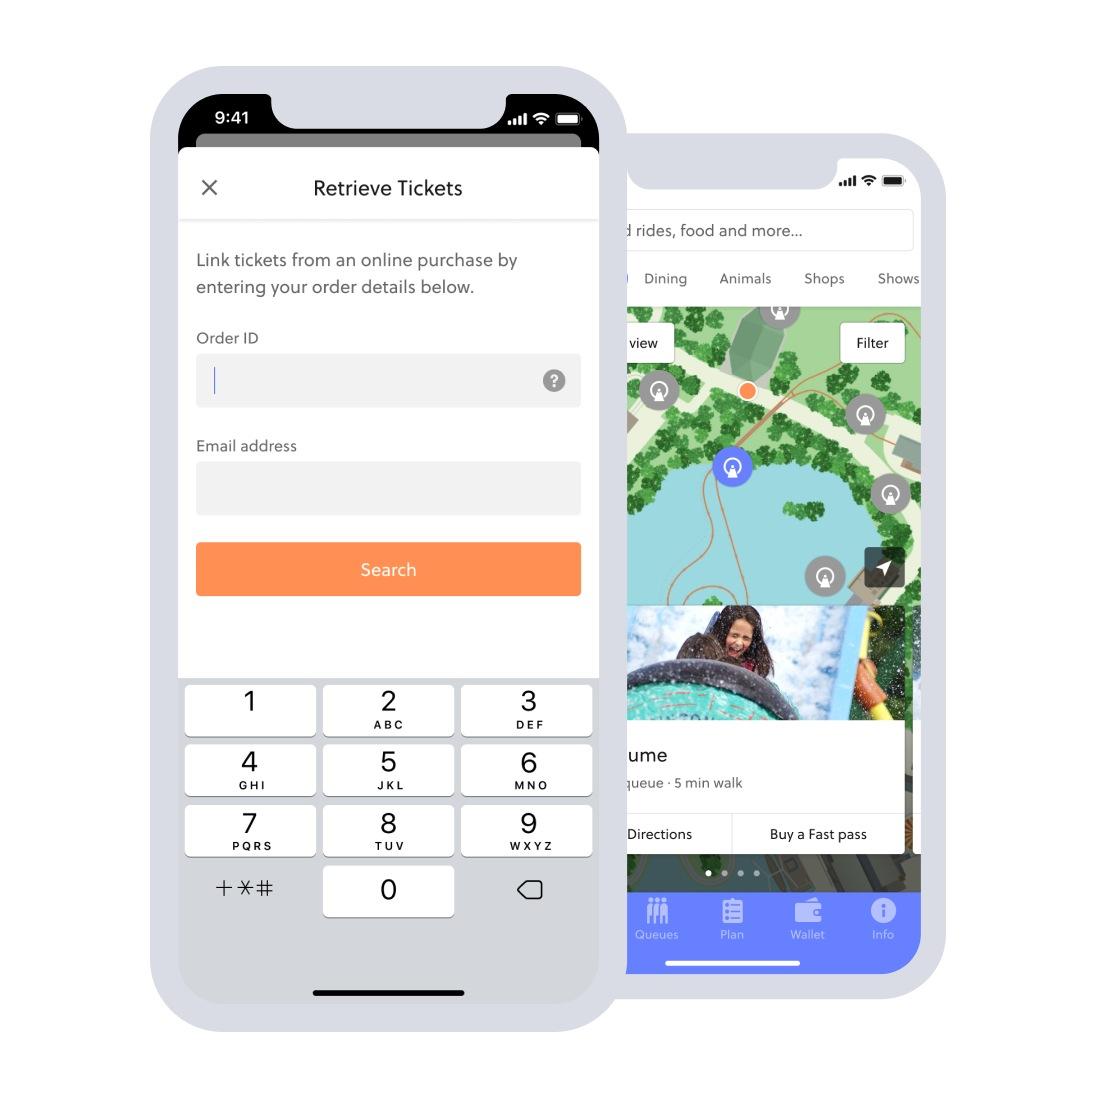 retrieve tickets and digital map